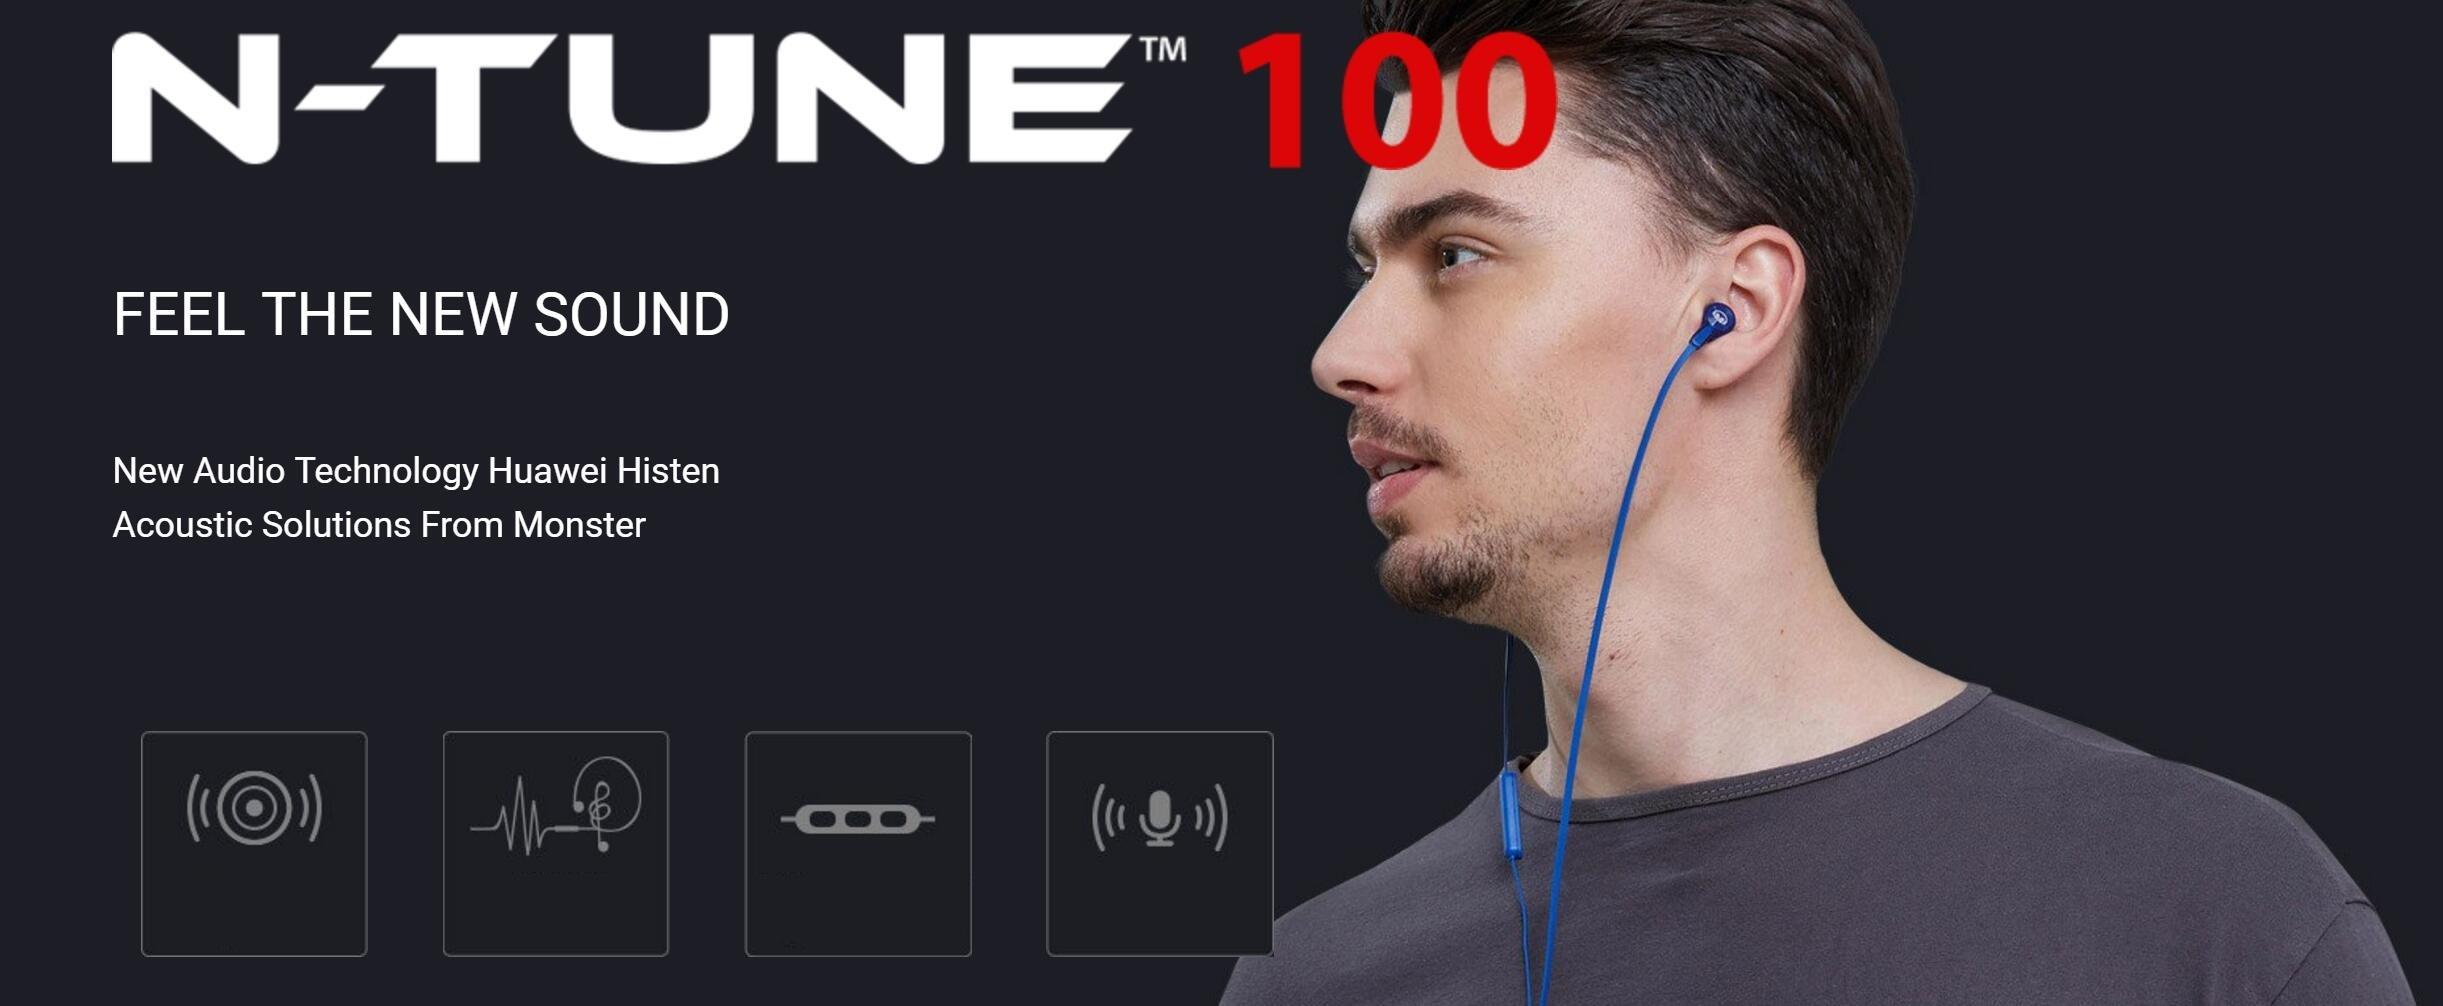 Honor Monster AM15 Headphones